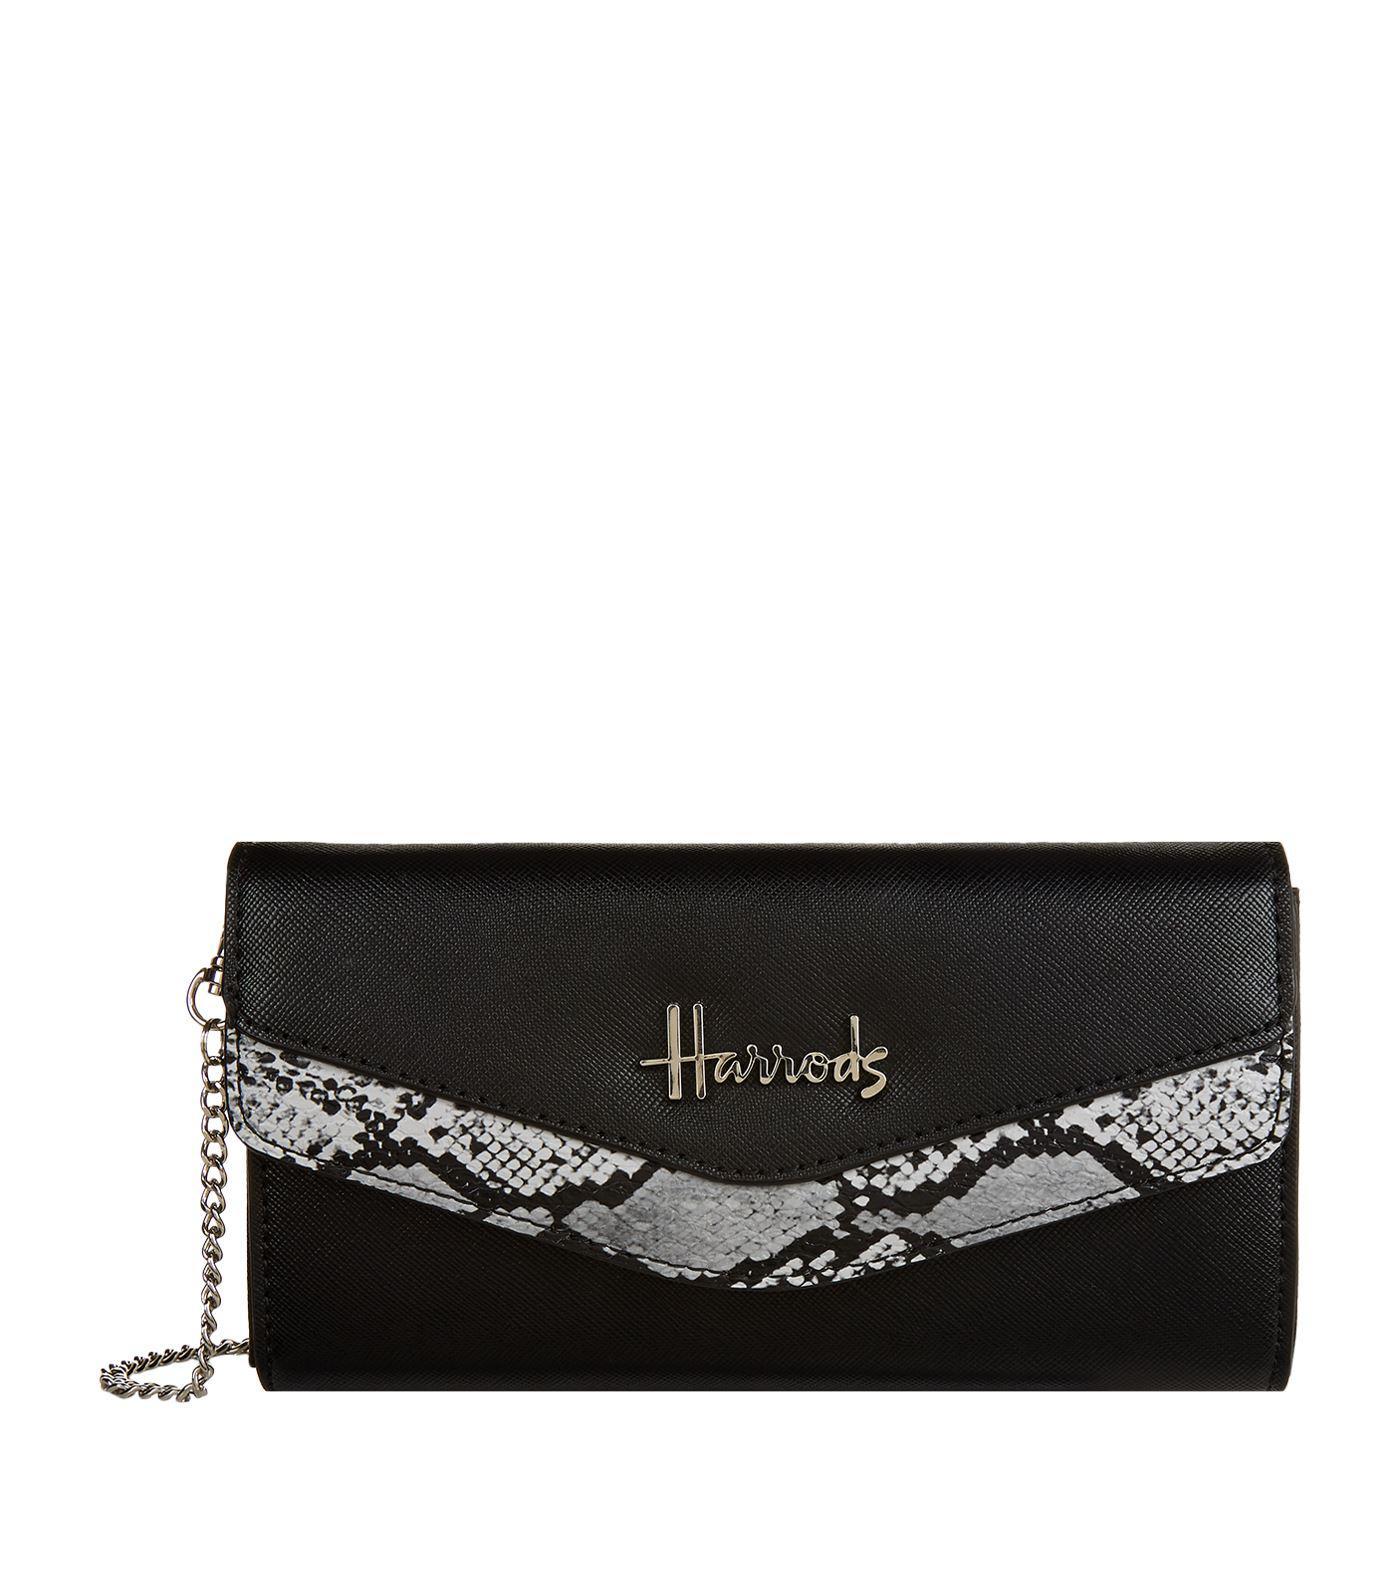 53dd289b2b72 Harrods Matilda Snake Print Wallet in Black - Save ...